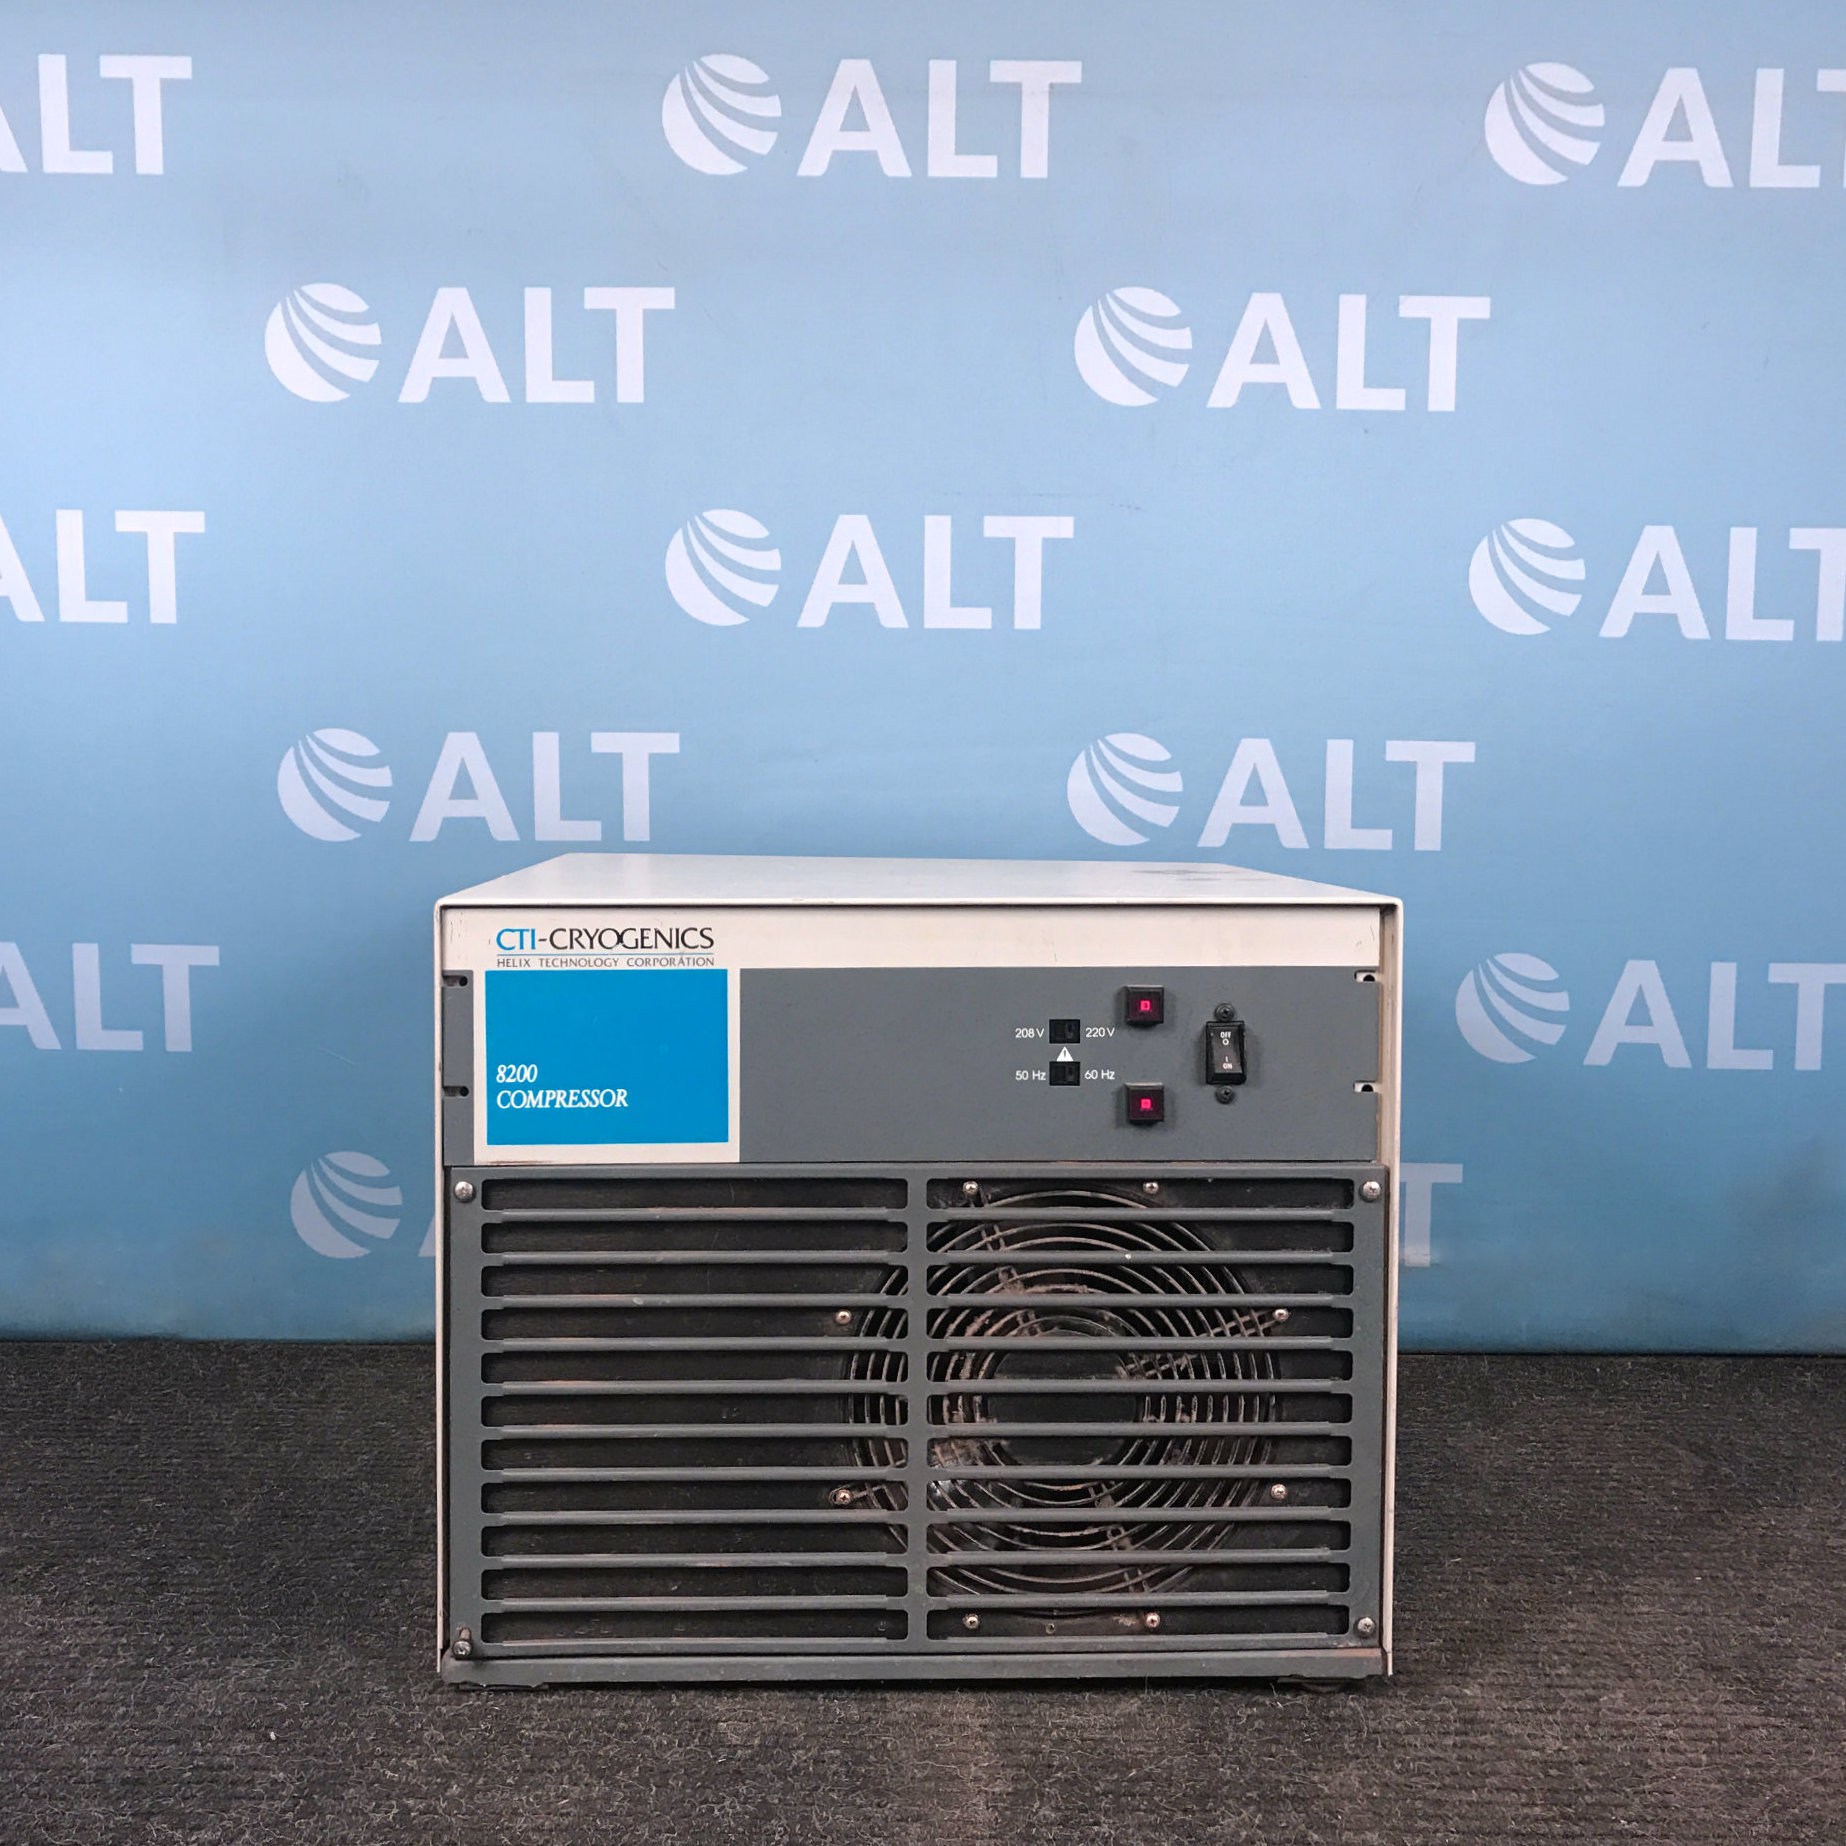 CTI-Cryogenics  8200 Compressor  Image